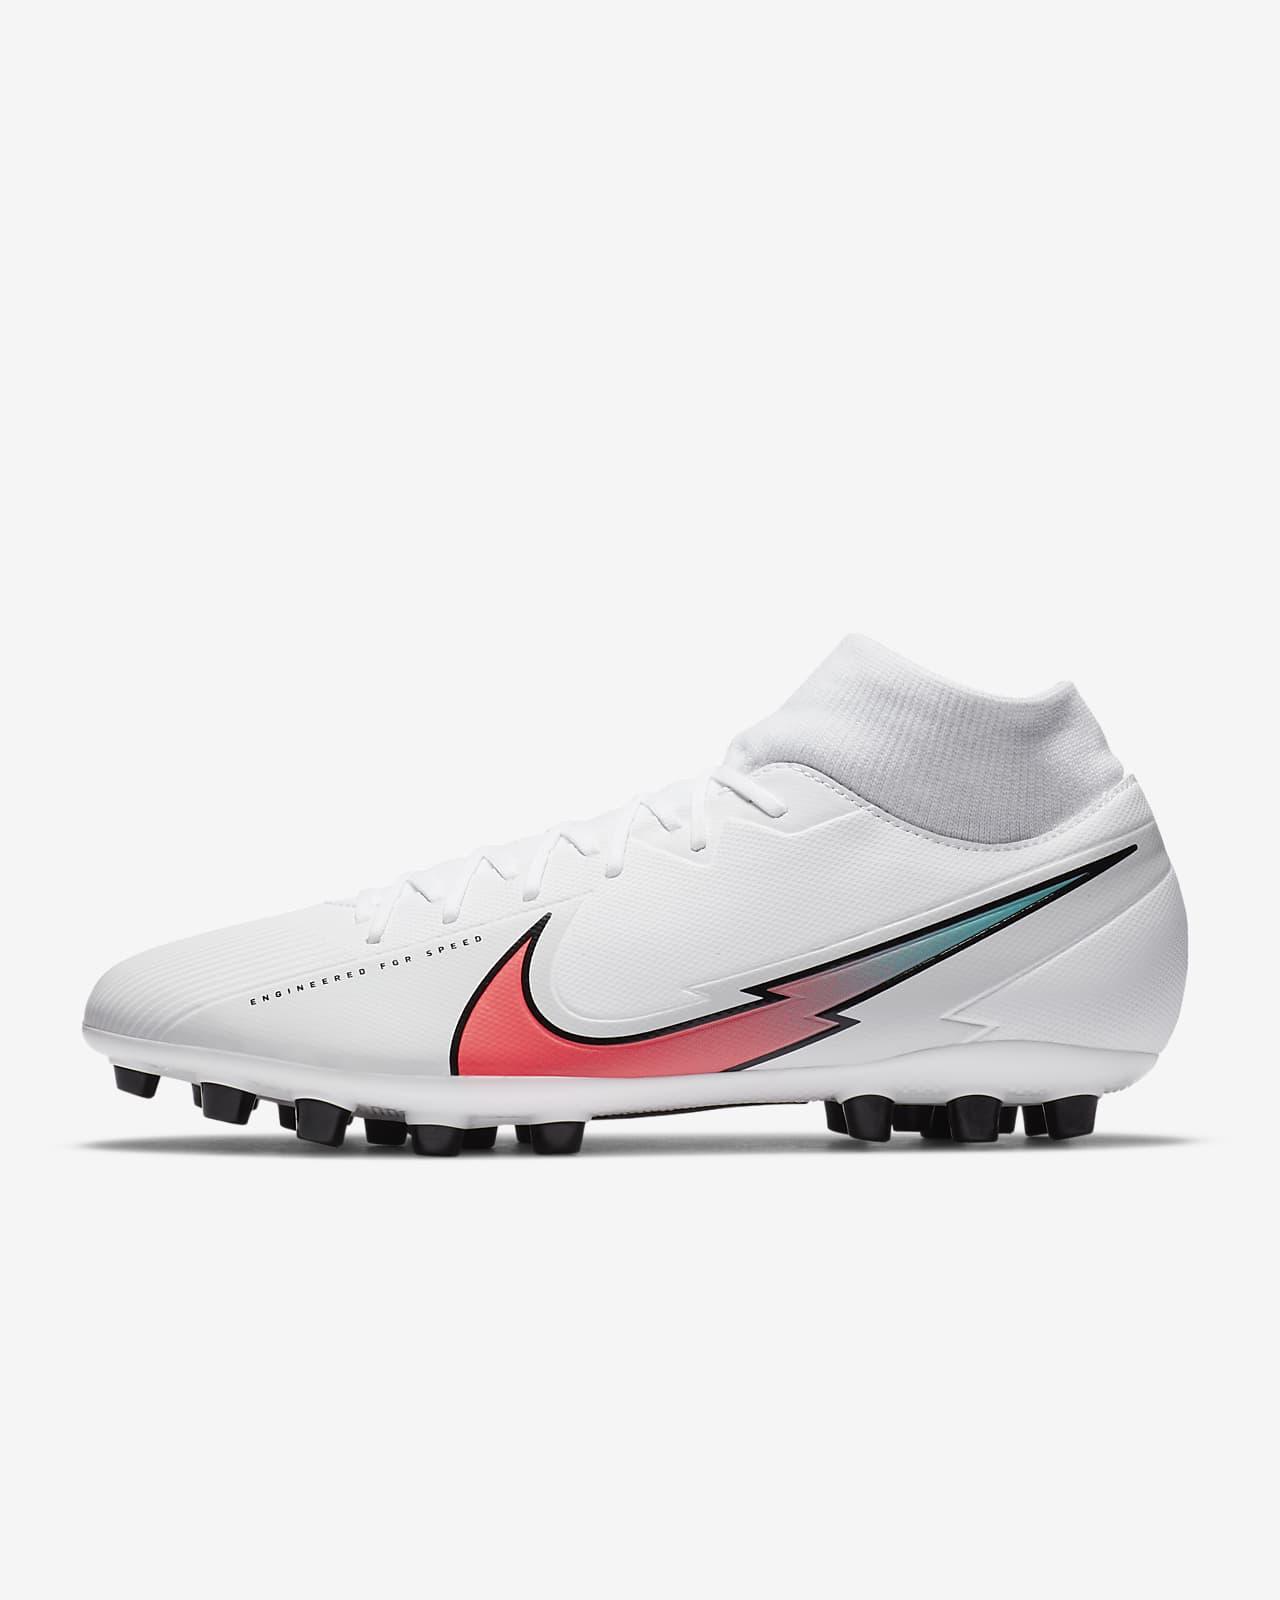 Calzado de fútbol para césped artificial Nike Mercurial Superfly 7 Academy AG